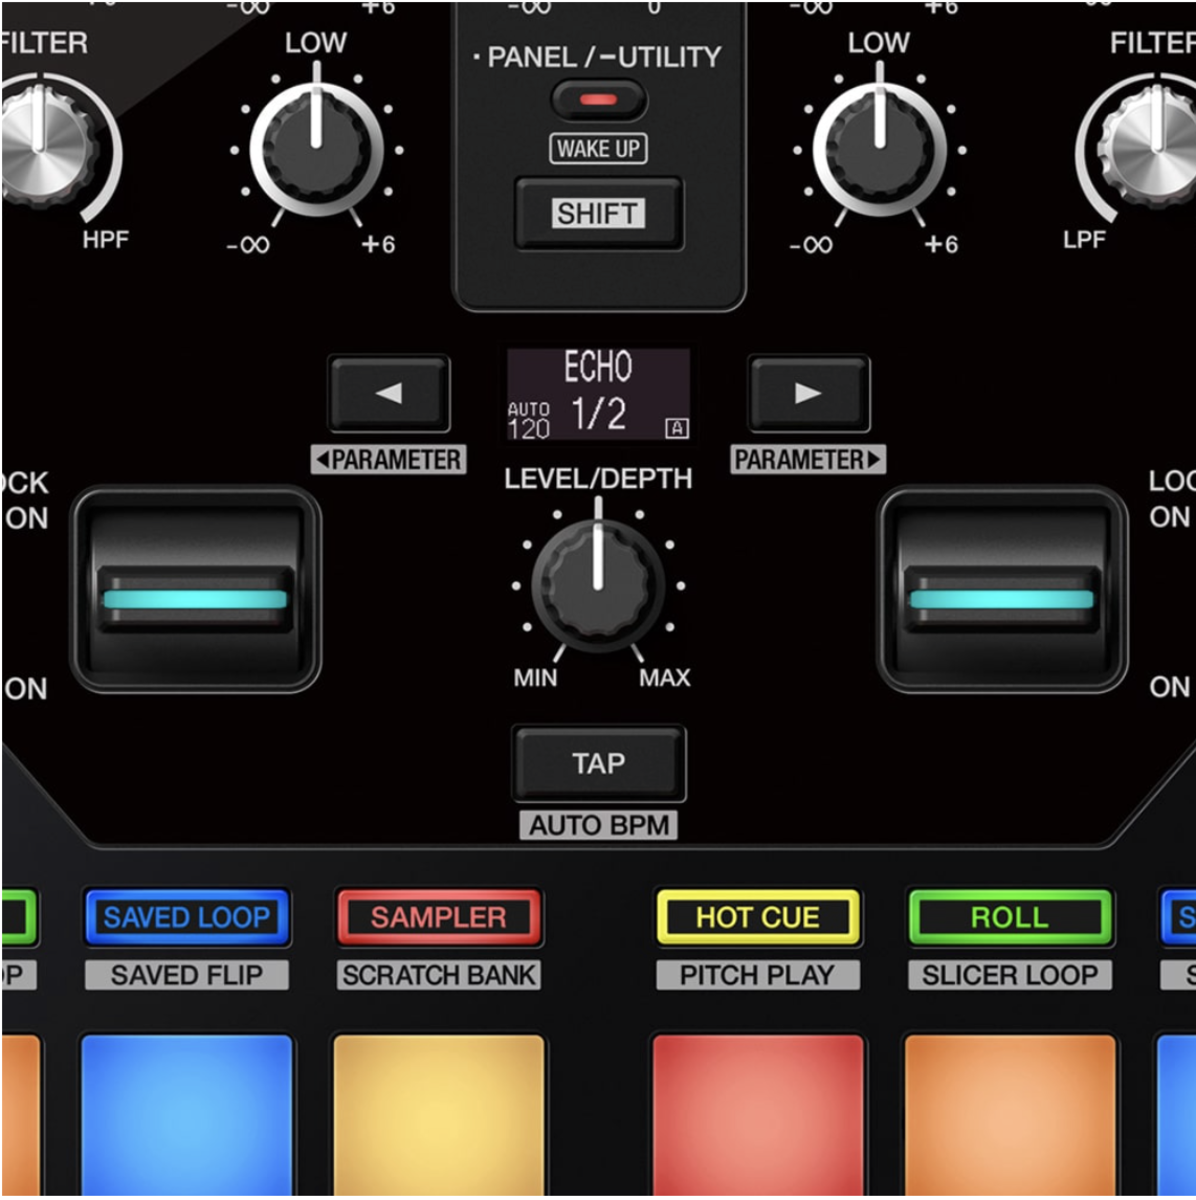 Pioneer DJ DJM-S7 Scratch bank